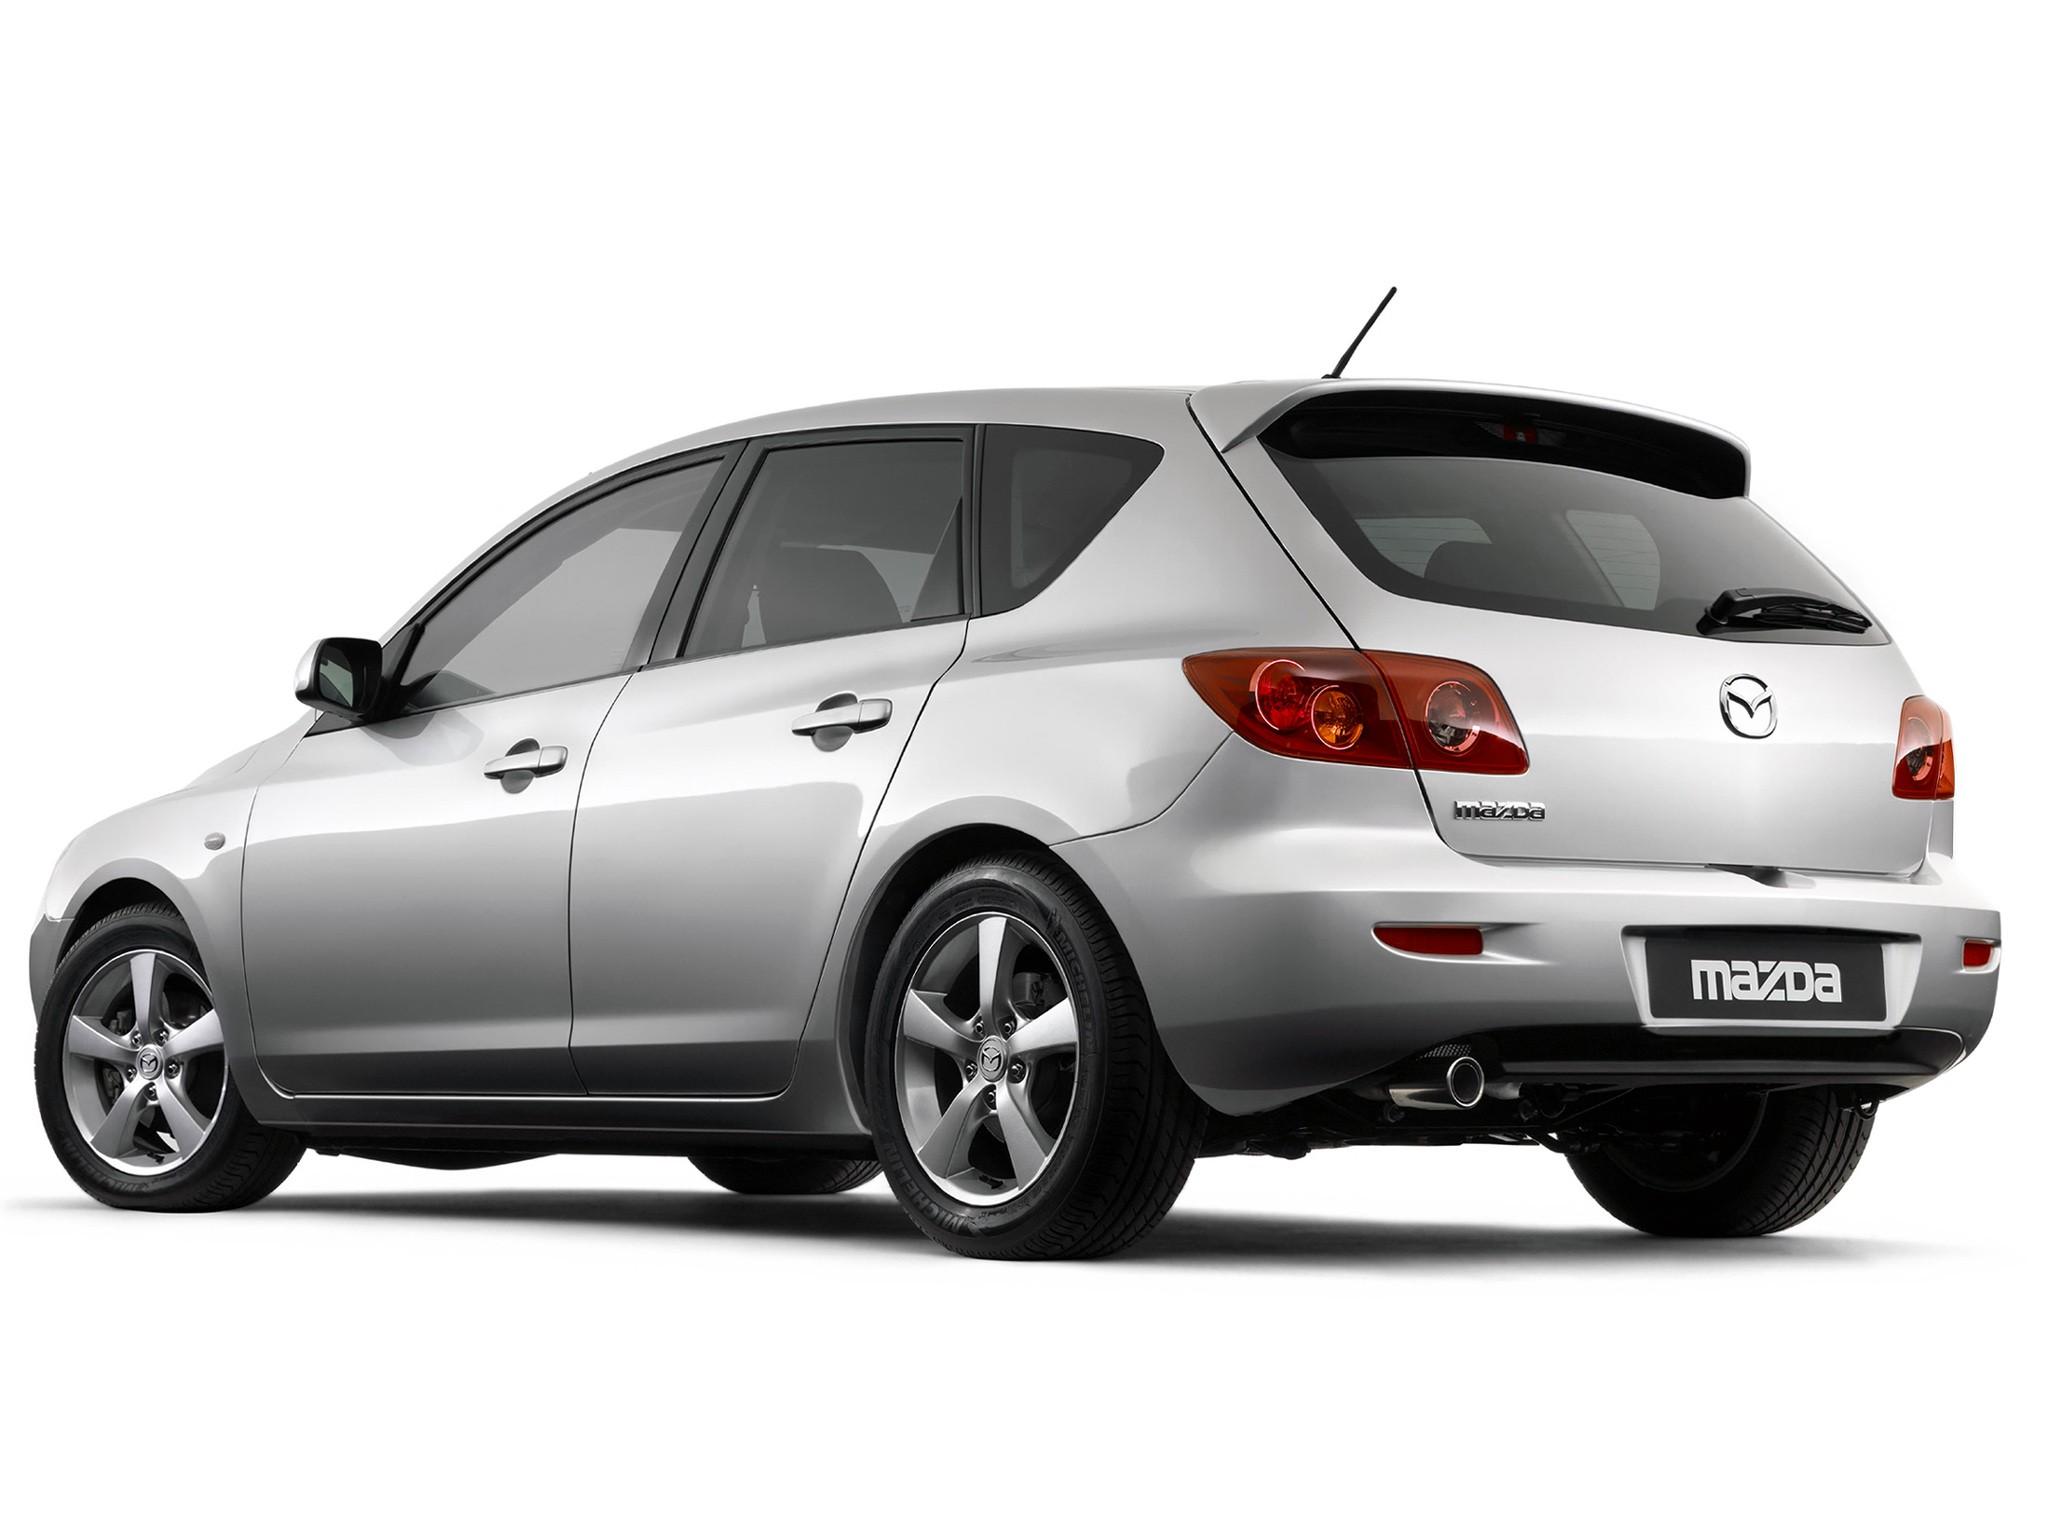 2007 Ford Focus Hatchback >> MAZDA 3 / Axela Hatchback specs & photos - 2004, 2005, 2006, 2007, 2008, 2009 - autoevolution